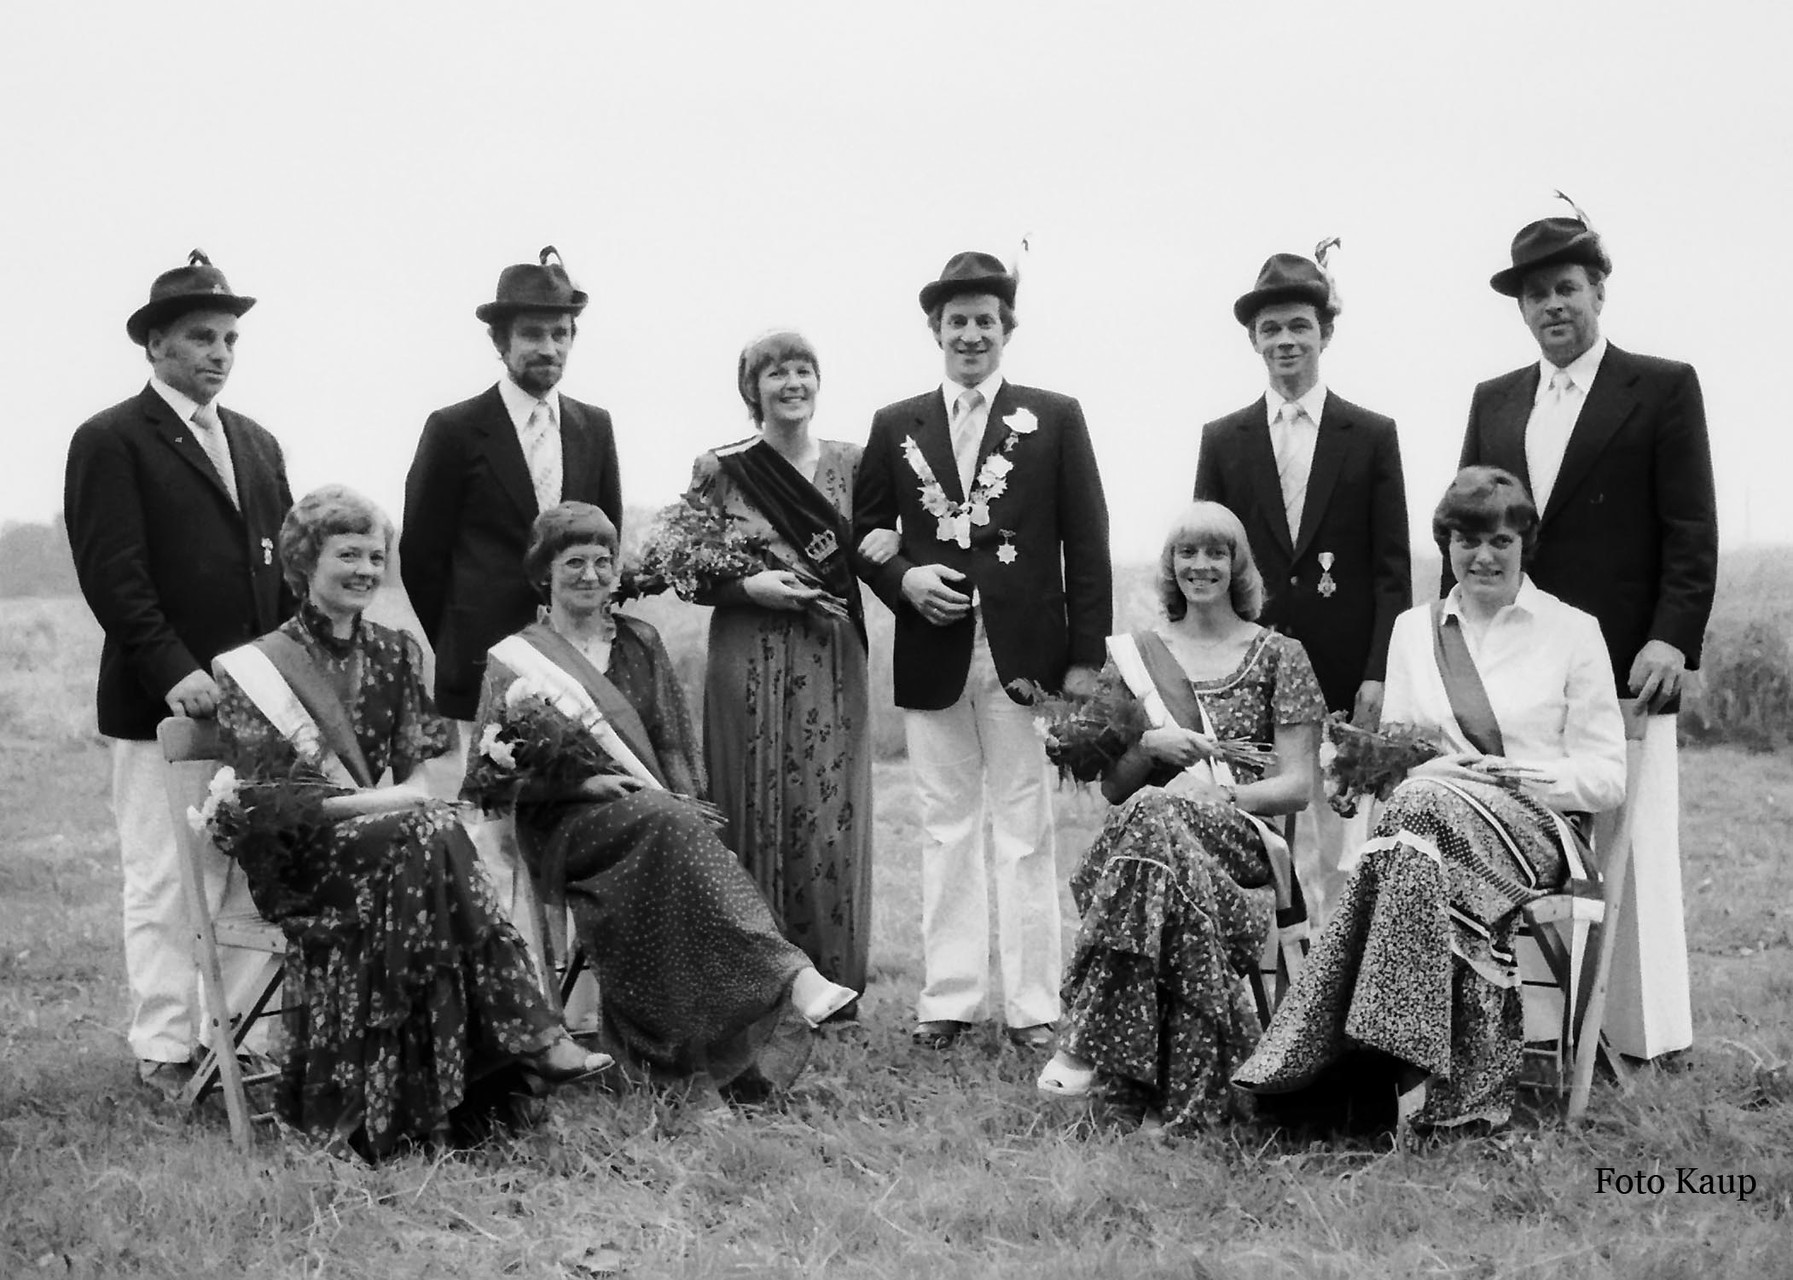 1980: König Alfons Hagemeyer und Königin Gabi Hagemeyer